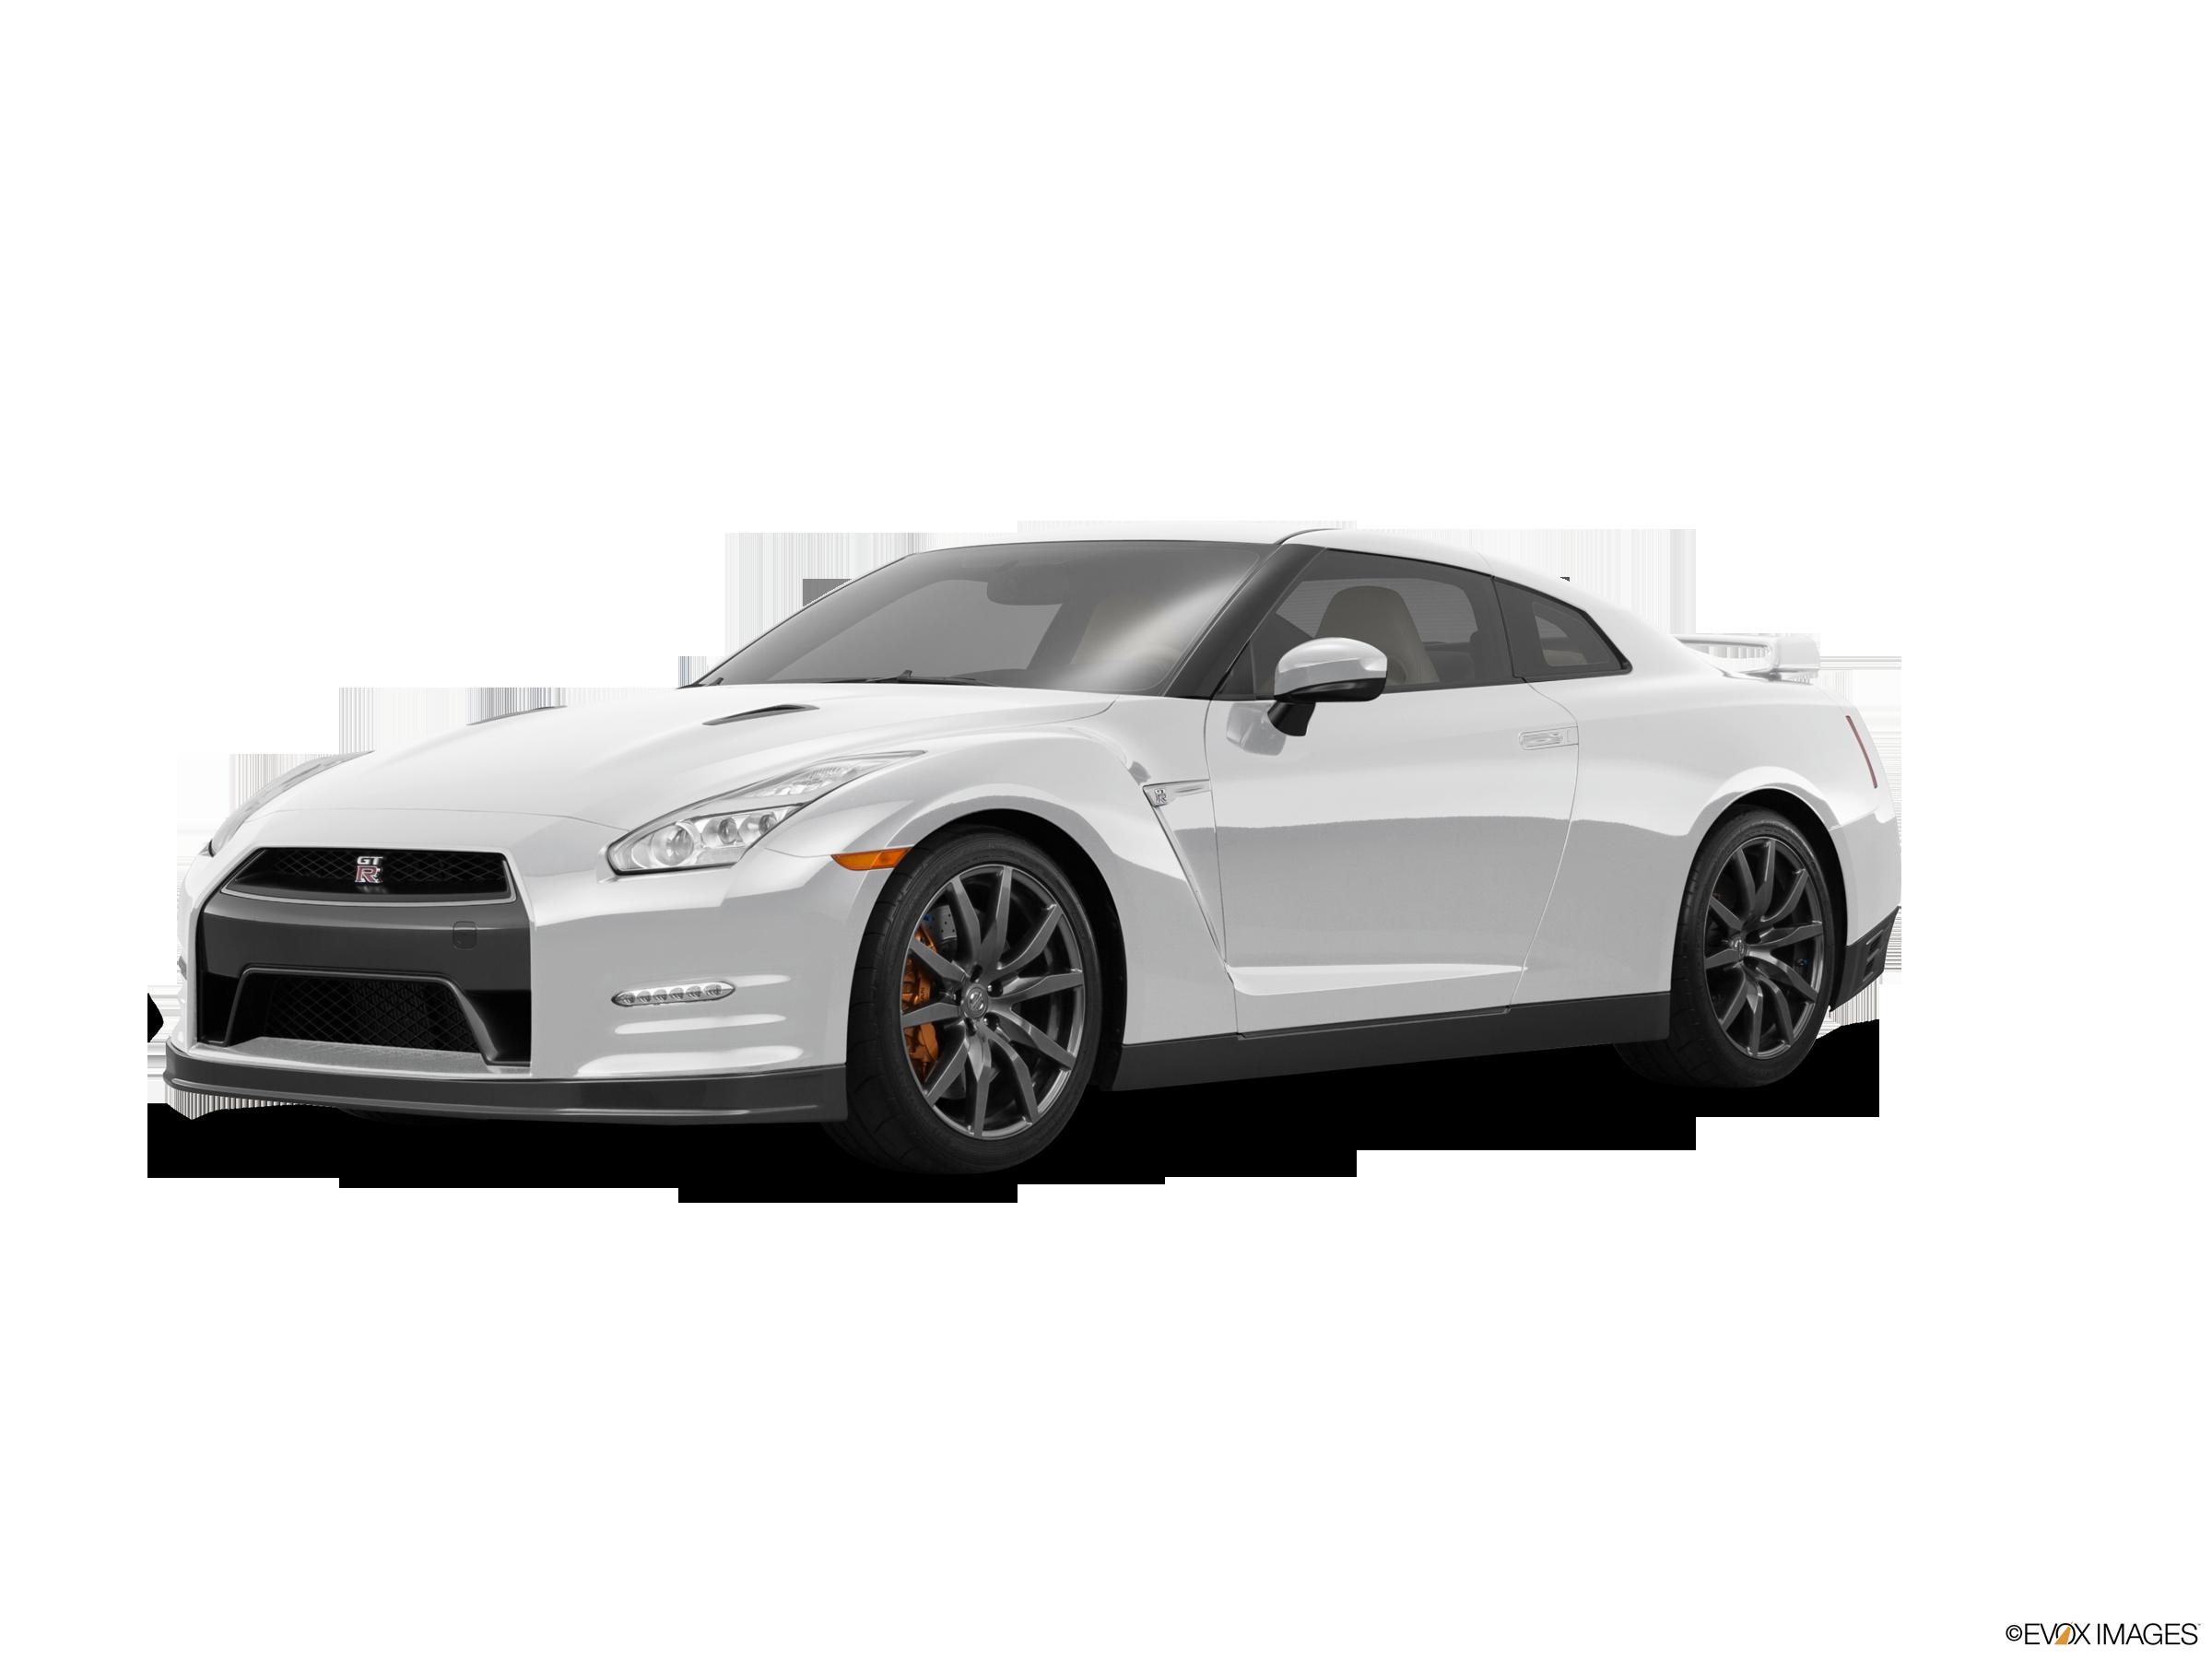 2015 Nissan GT-R